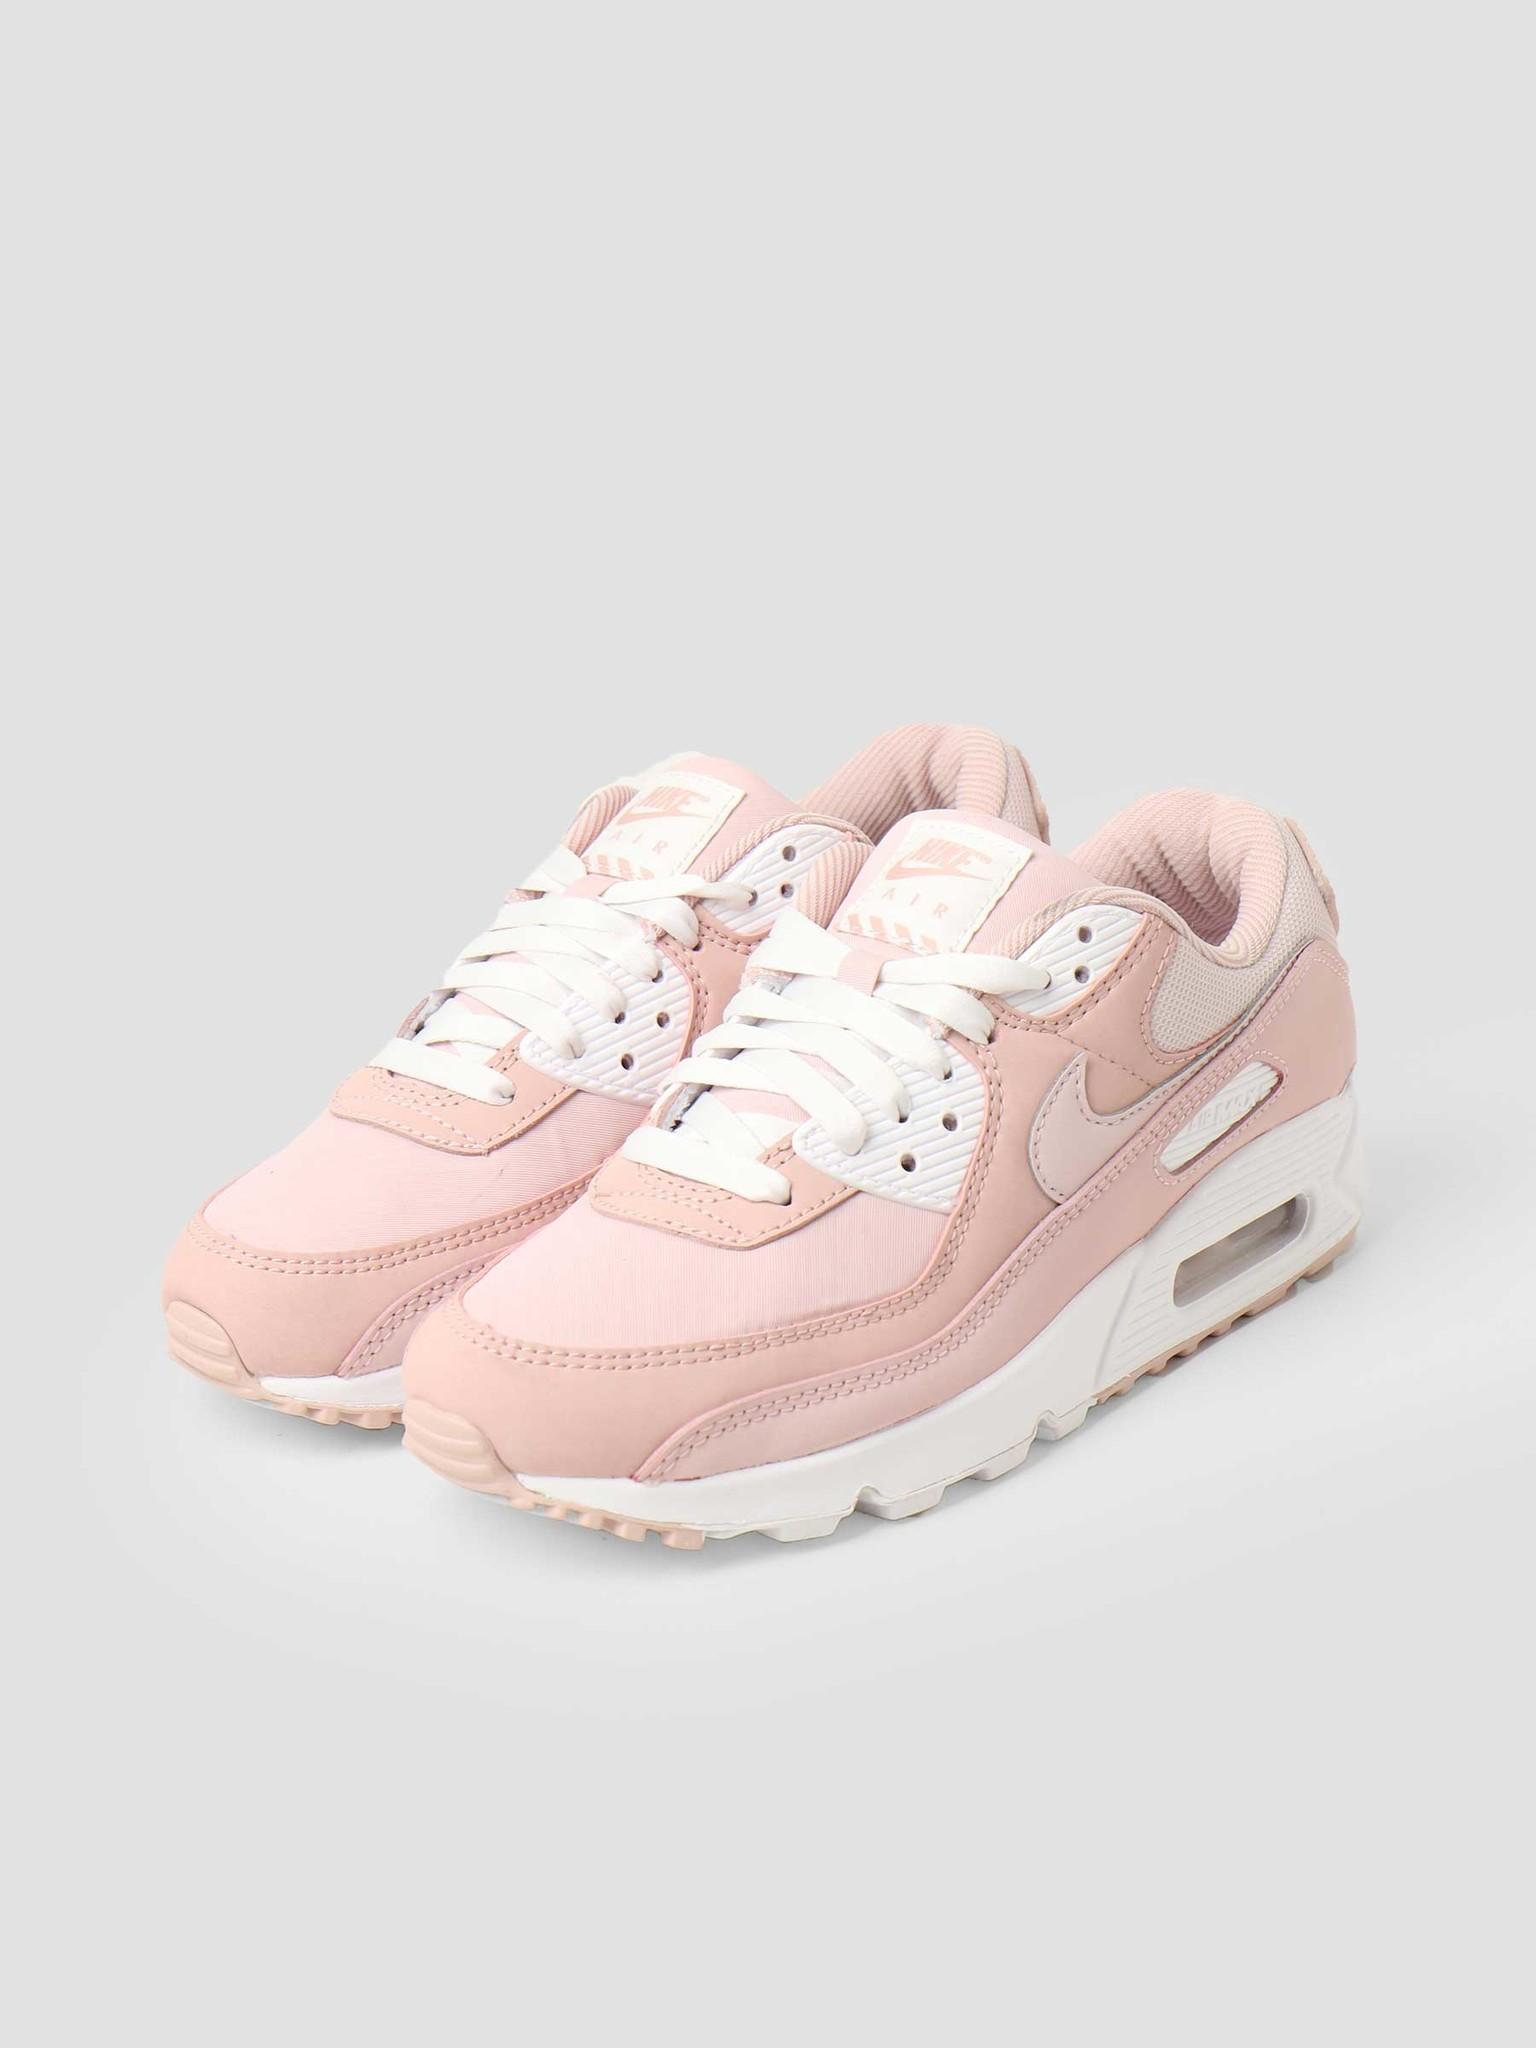 Nike Nike W Air Max 90 Barely Rose Barely Rose Pink Oxford DJ3862-600